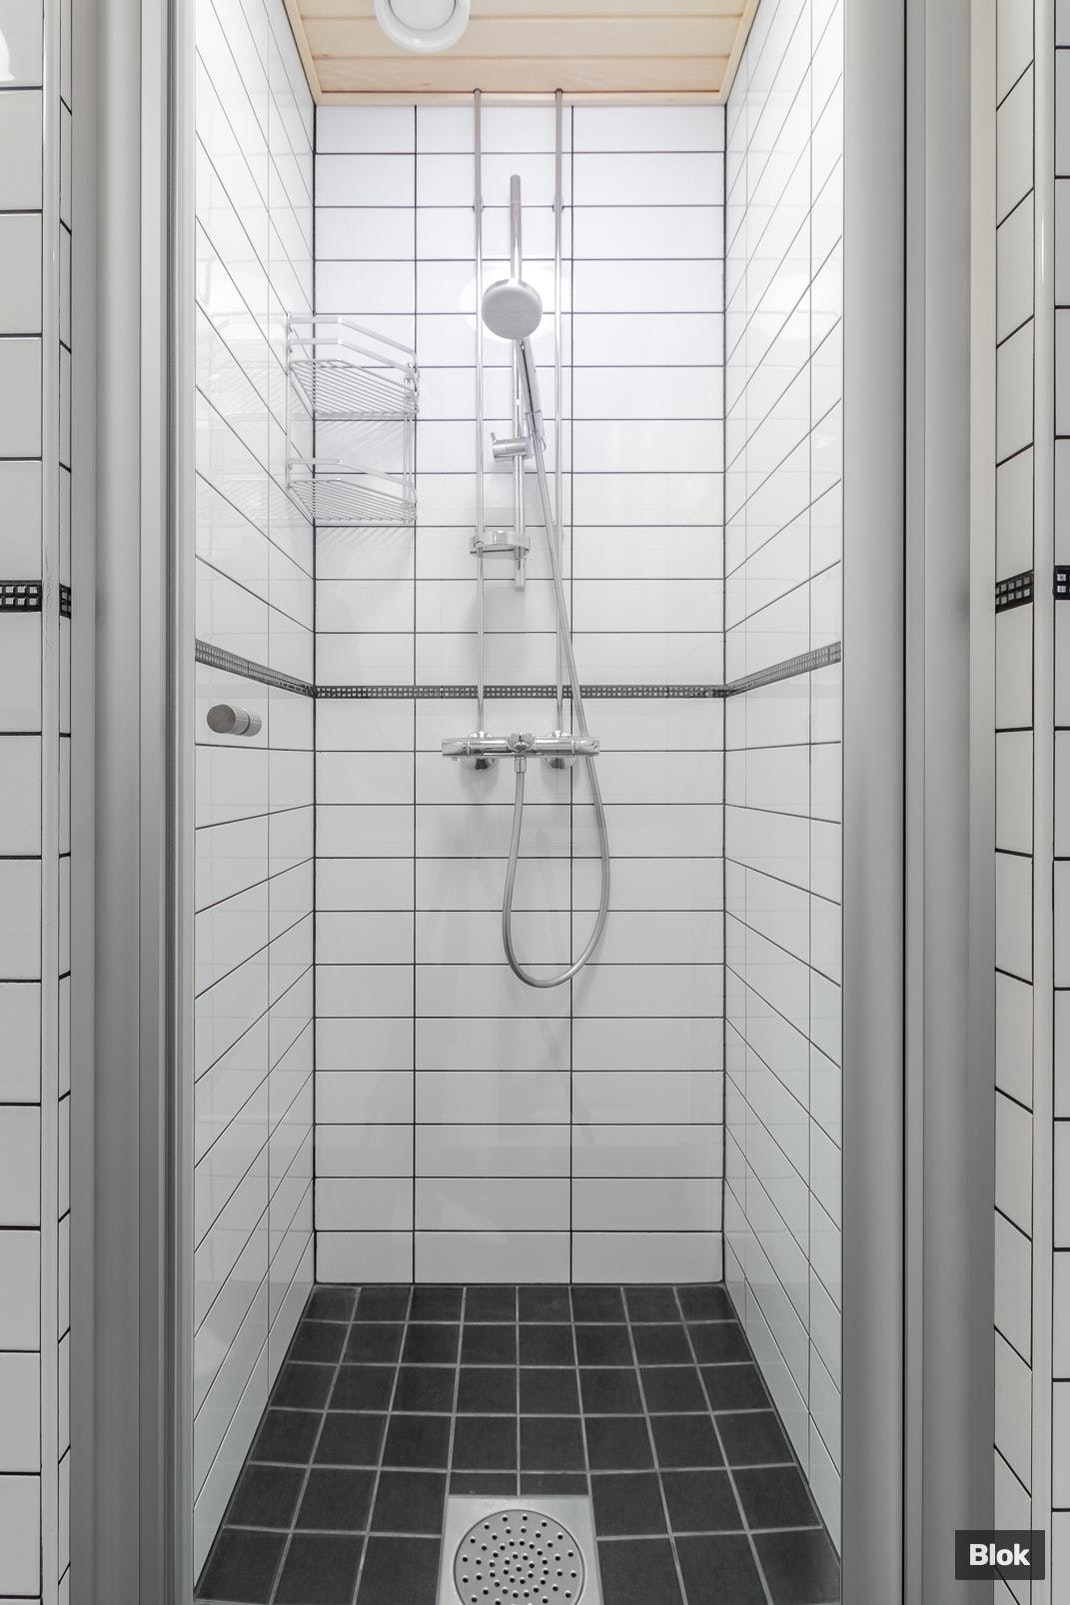 Proomukatu 2 A 27 Kylpyhuone & Sauna & Erillinen WC & Kodinhoitohuone